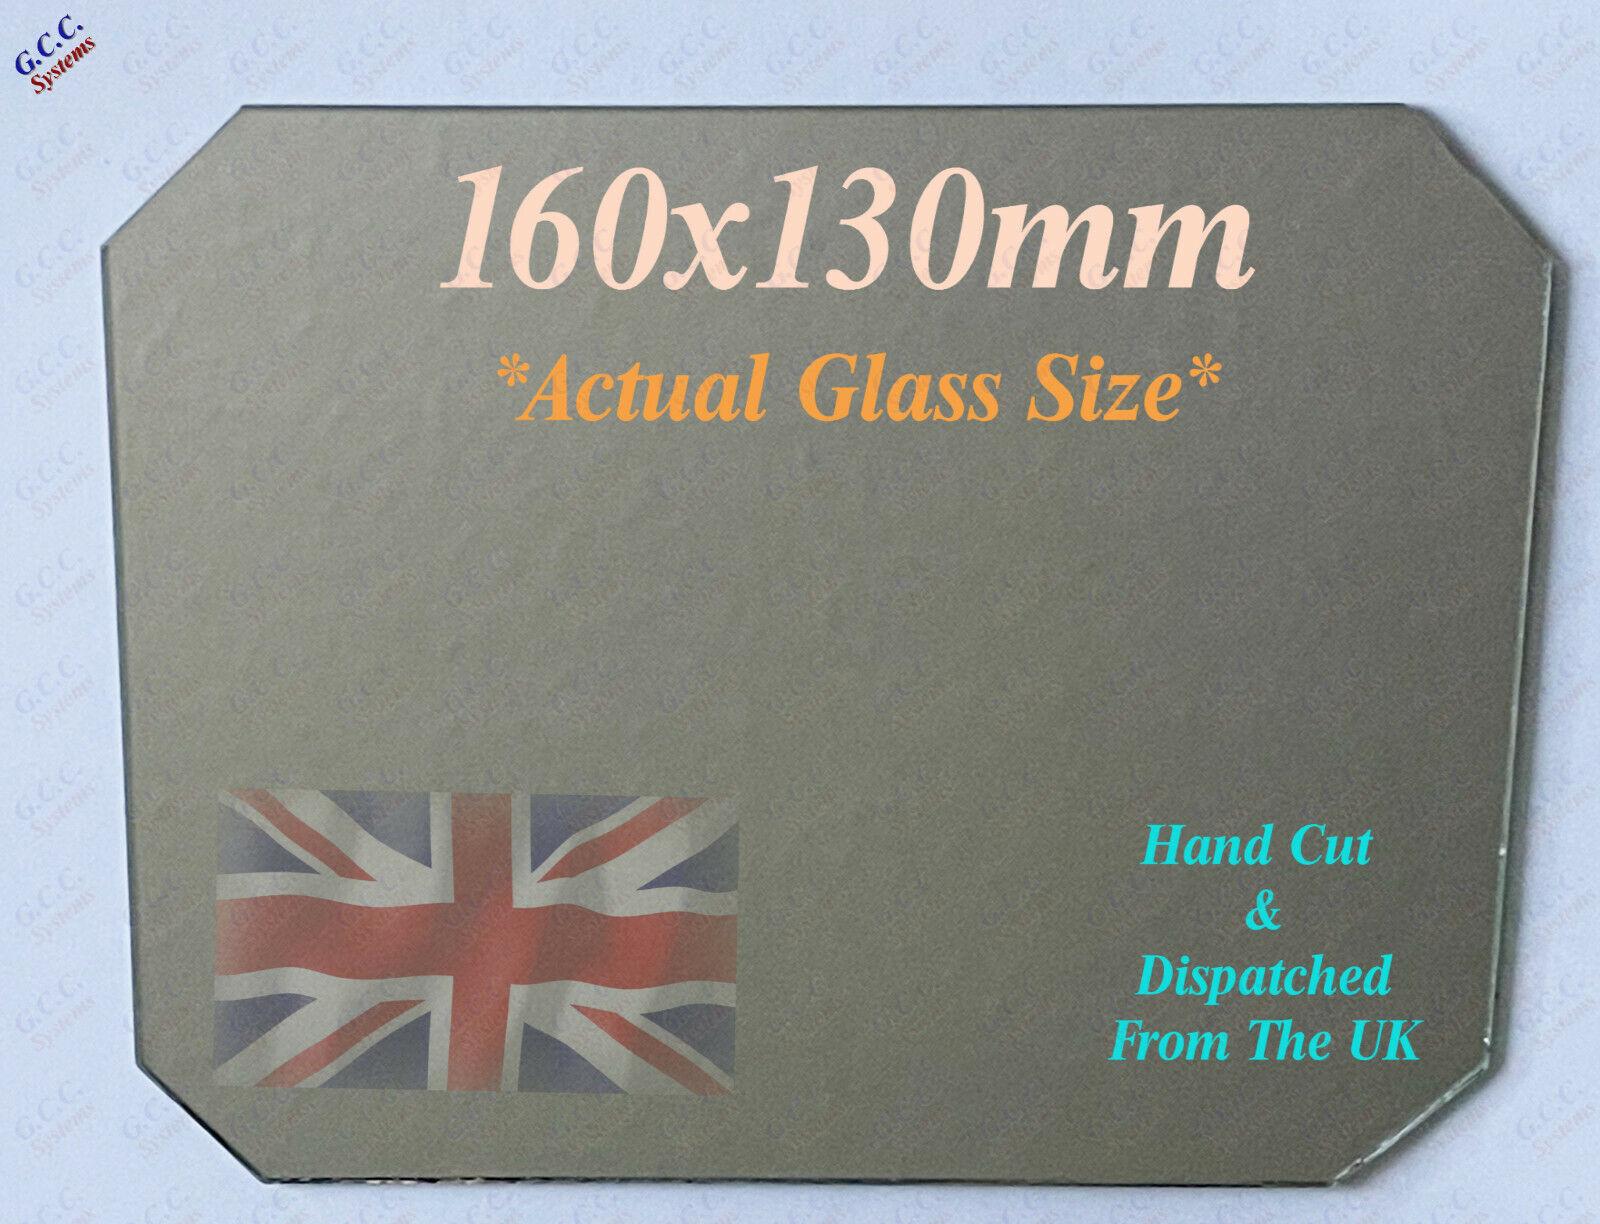 160 x 130mm Mirror Glass Plate 4 Heated 3D Printer Bed Monoprice Mini